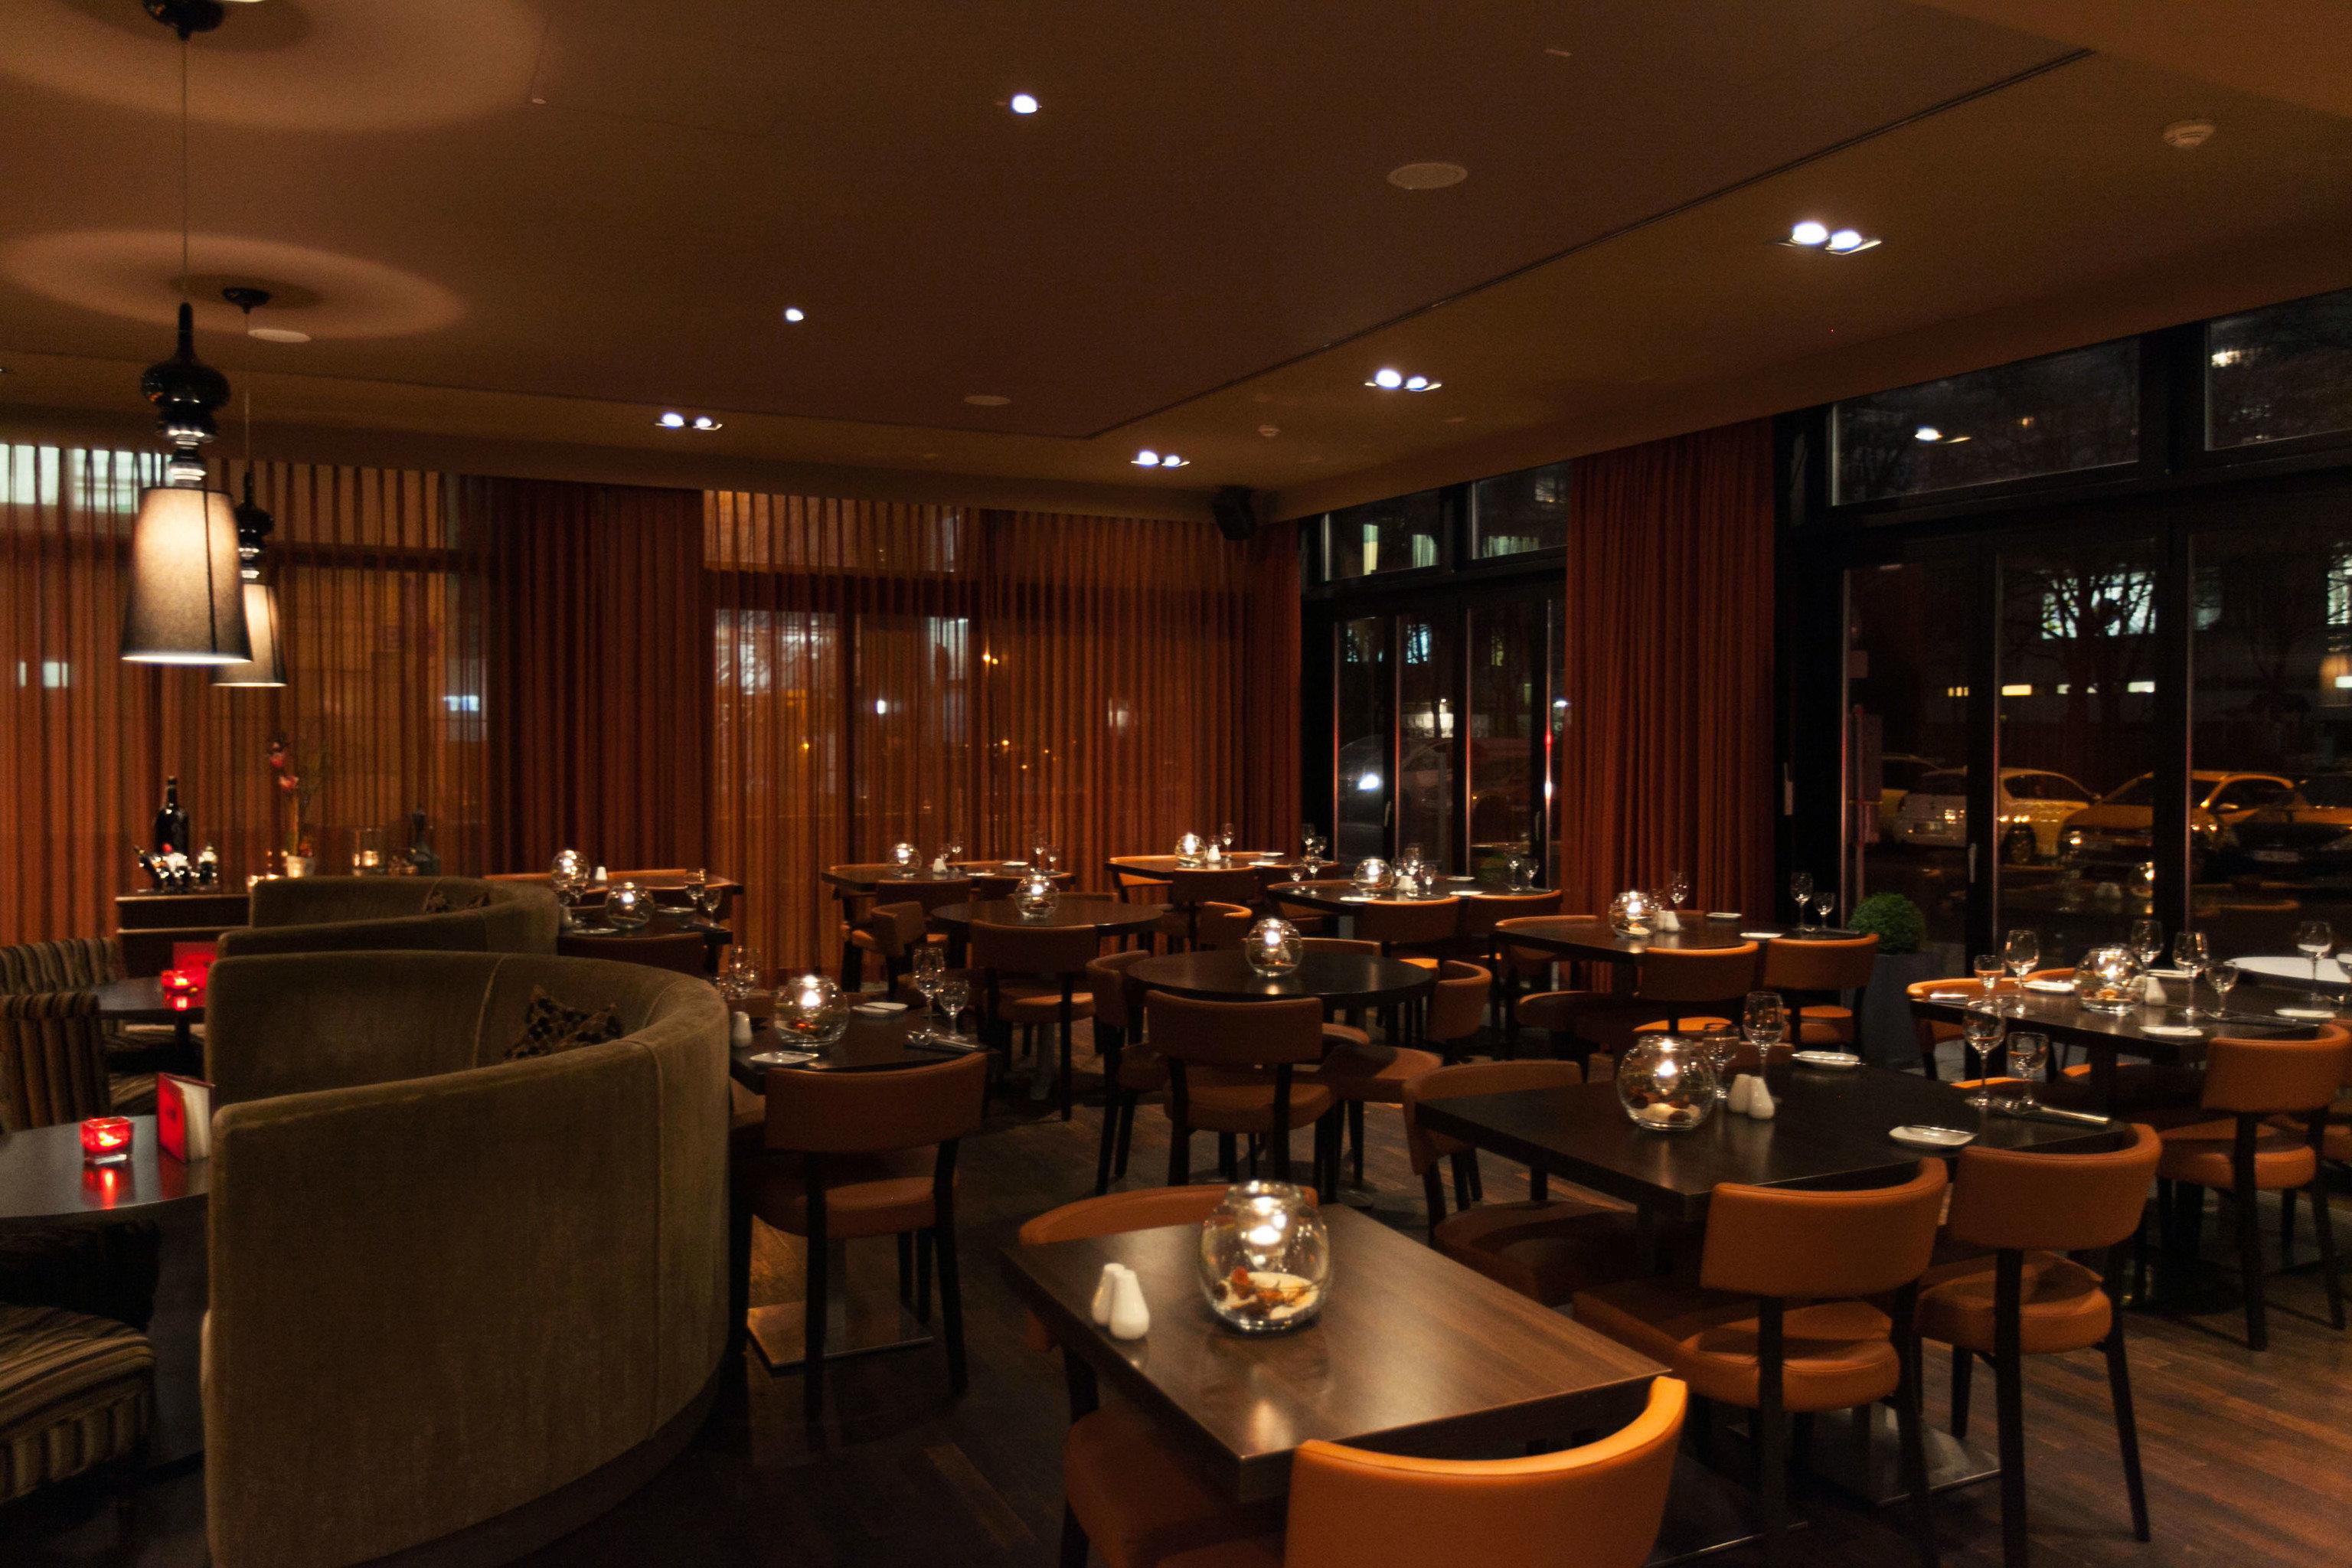 restaurant function hall café Lobby Bar conference hall convention center Dining